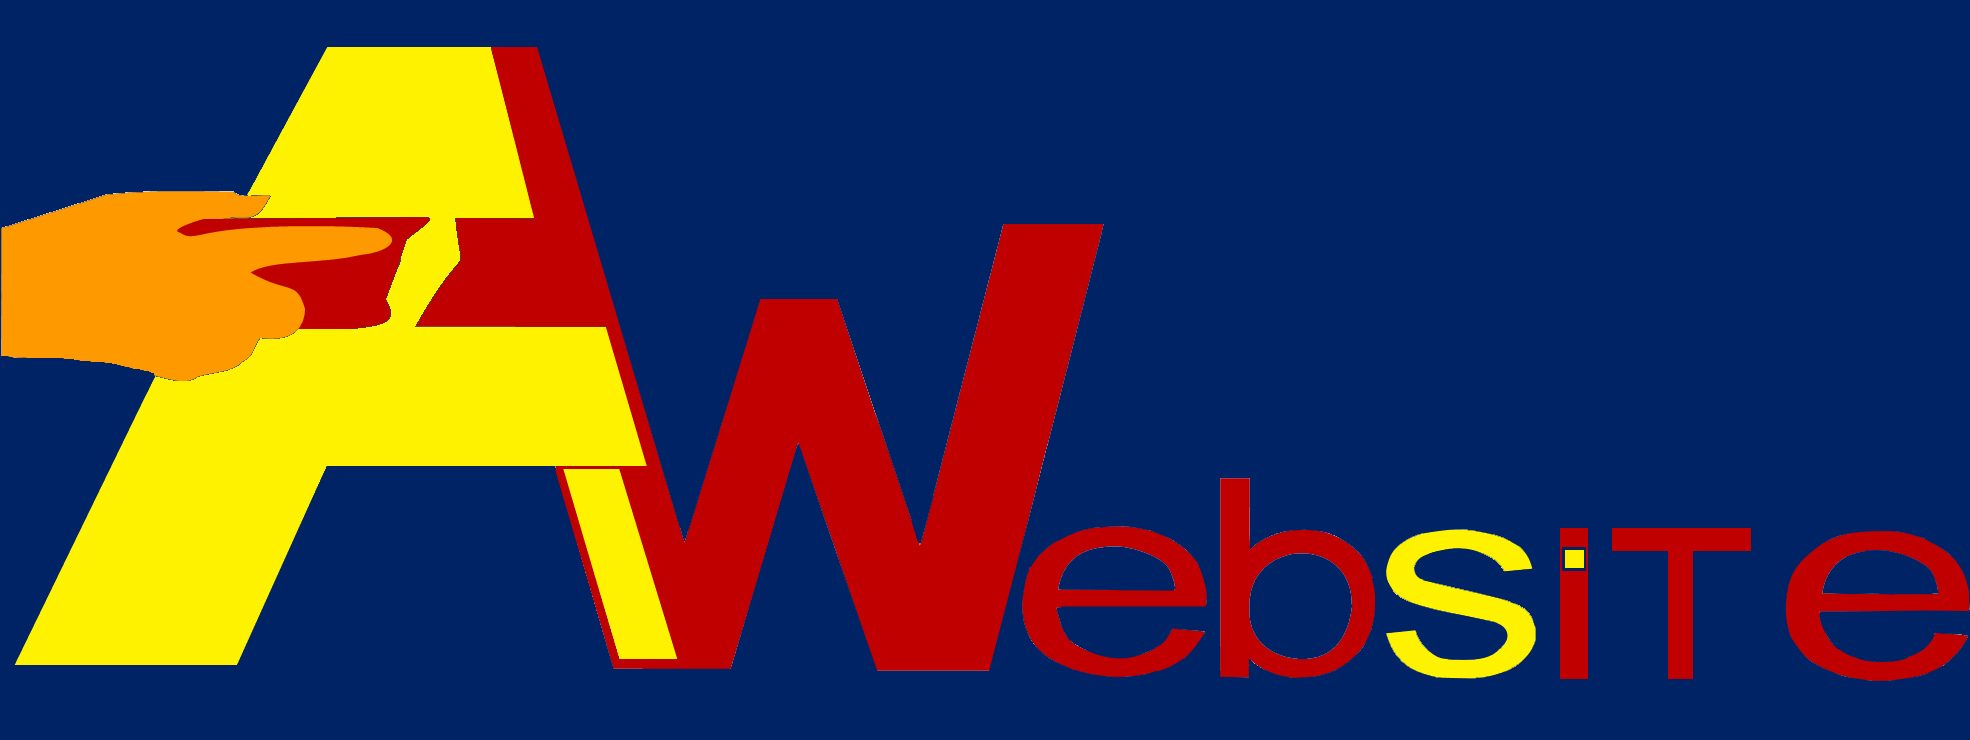 Awebsite – WhatsApp (96)991179248